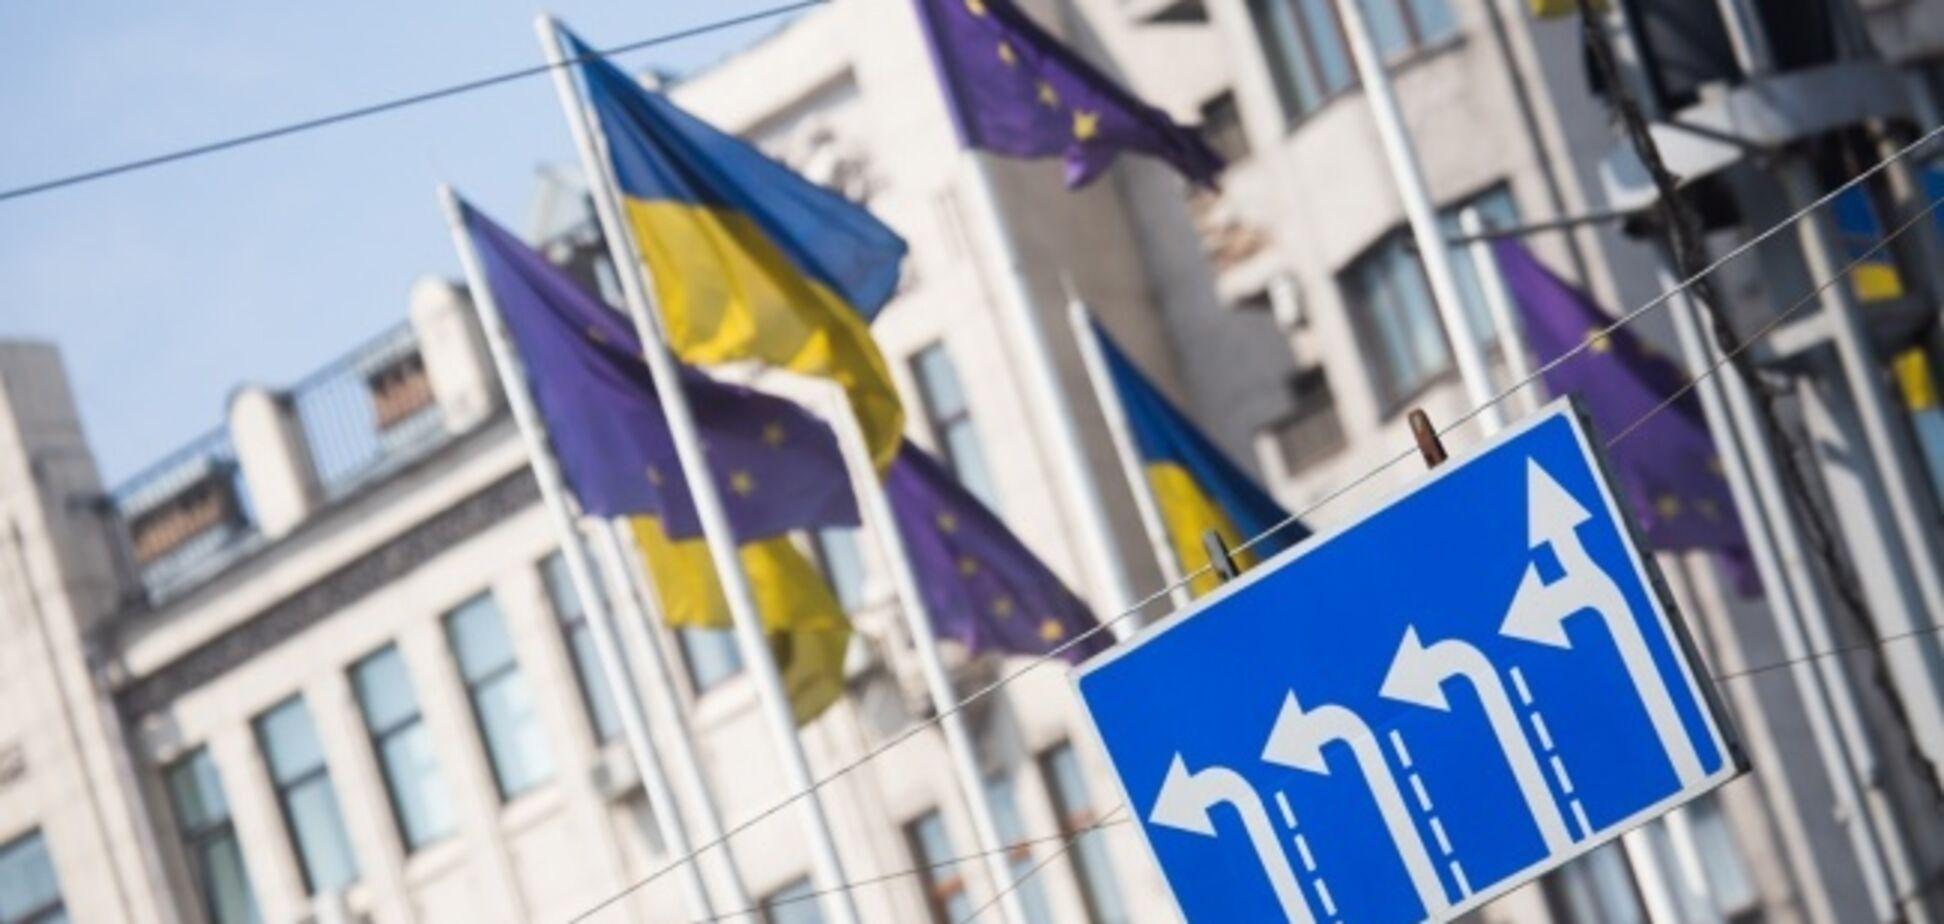 'На таке не наважувався ніхто': Chatham House назвав плюси і мінуси реформ в Україні